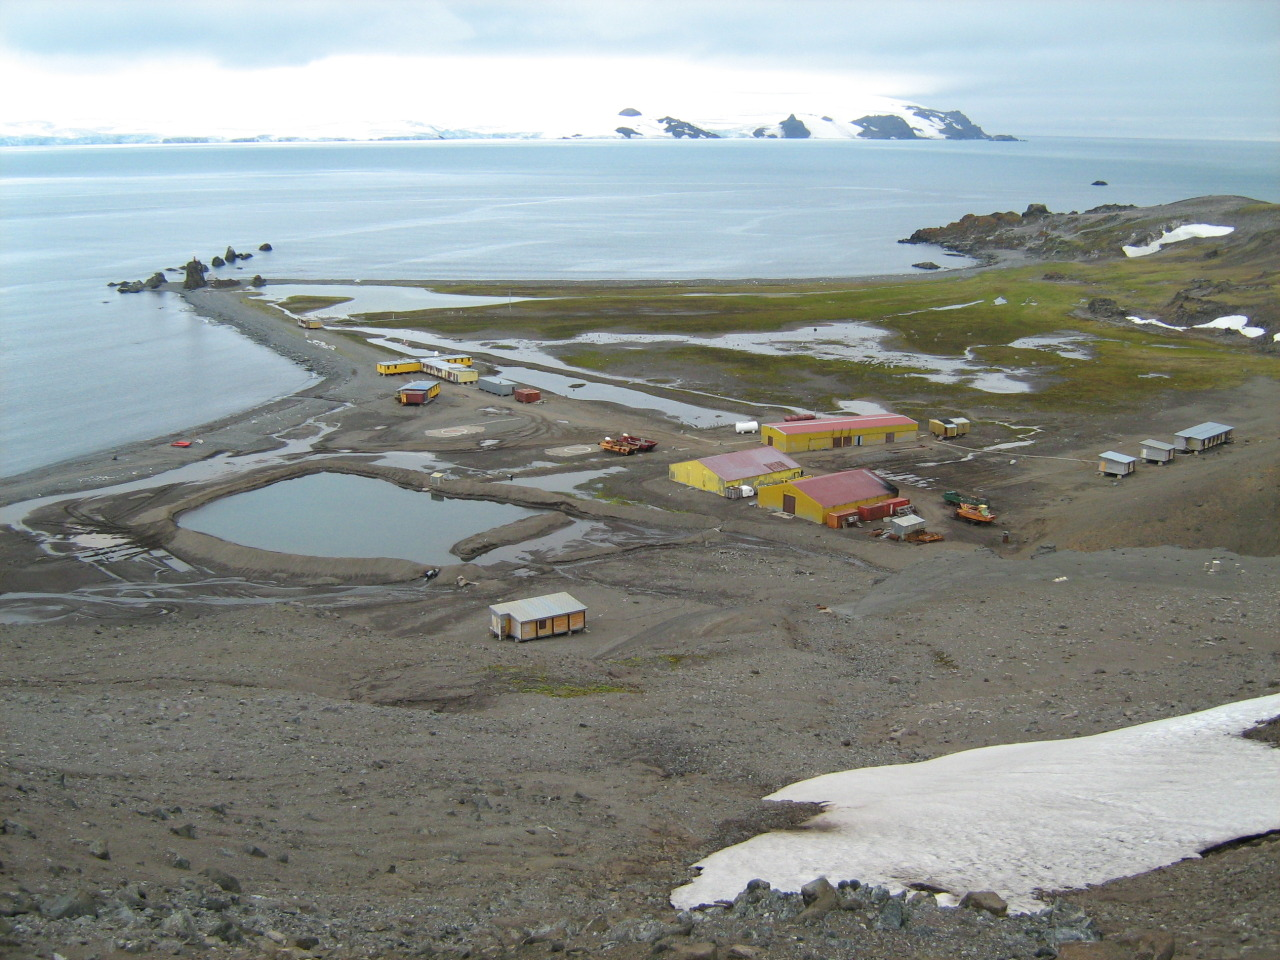 Vídeo | Cambio Climático. Cascadas de agua en la Antártida por la escasez de nieve